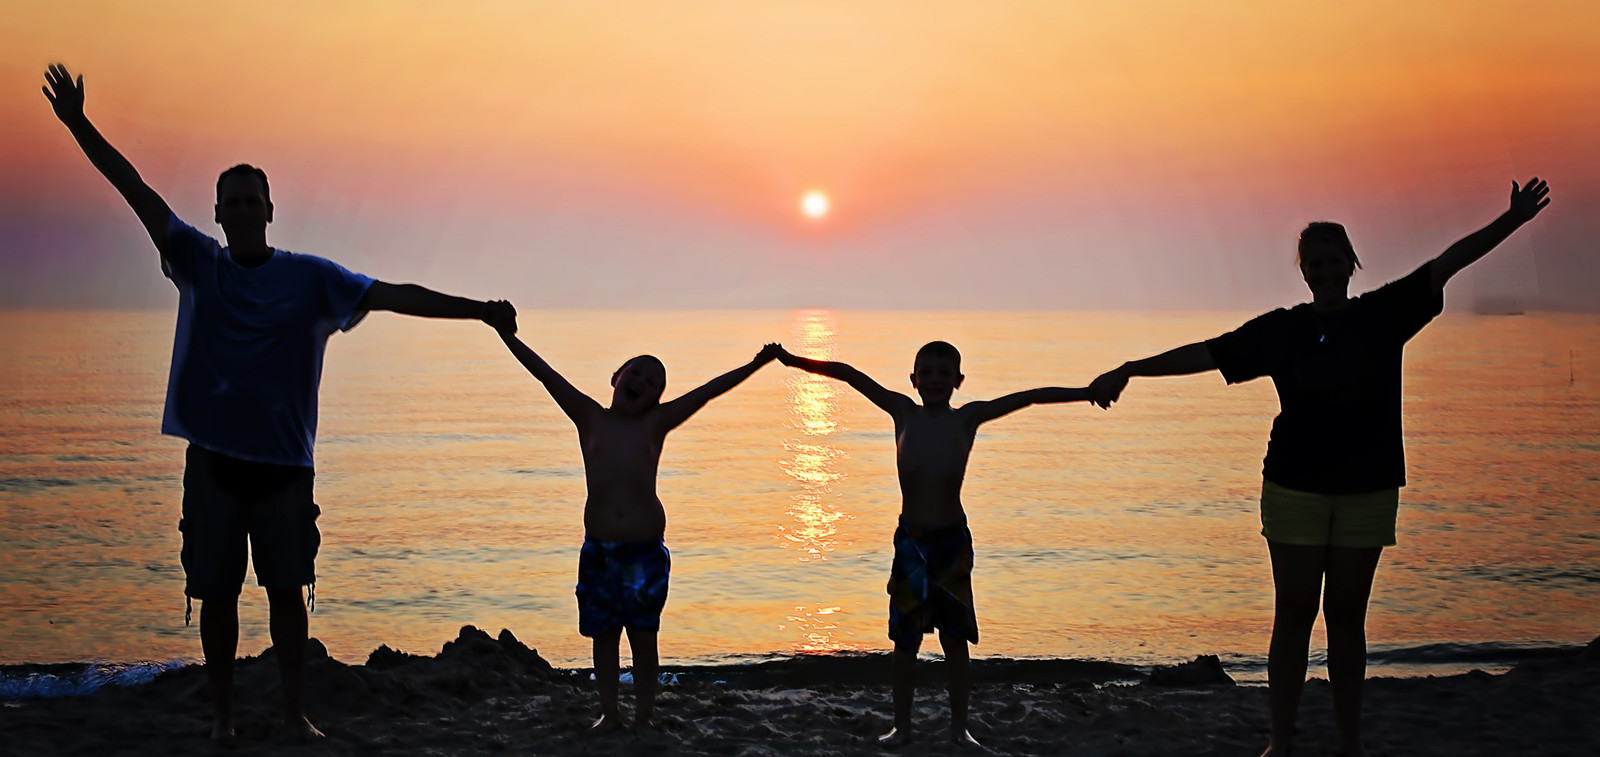 Perhe rannalla auringonlaskun aikaan